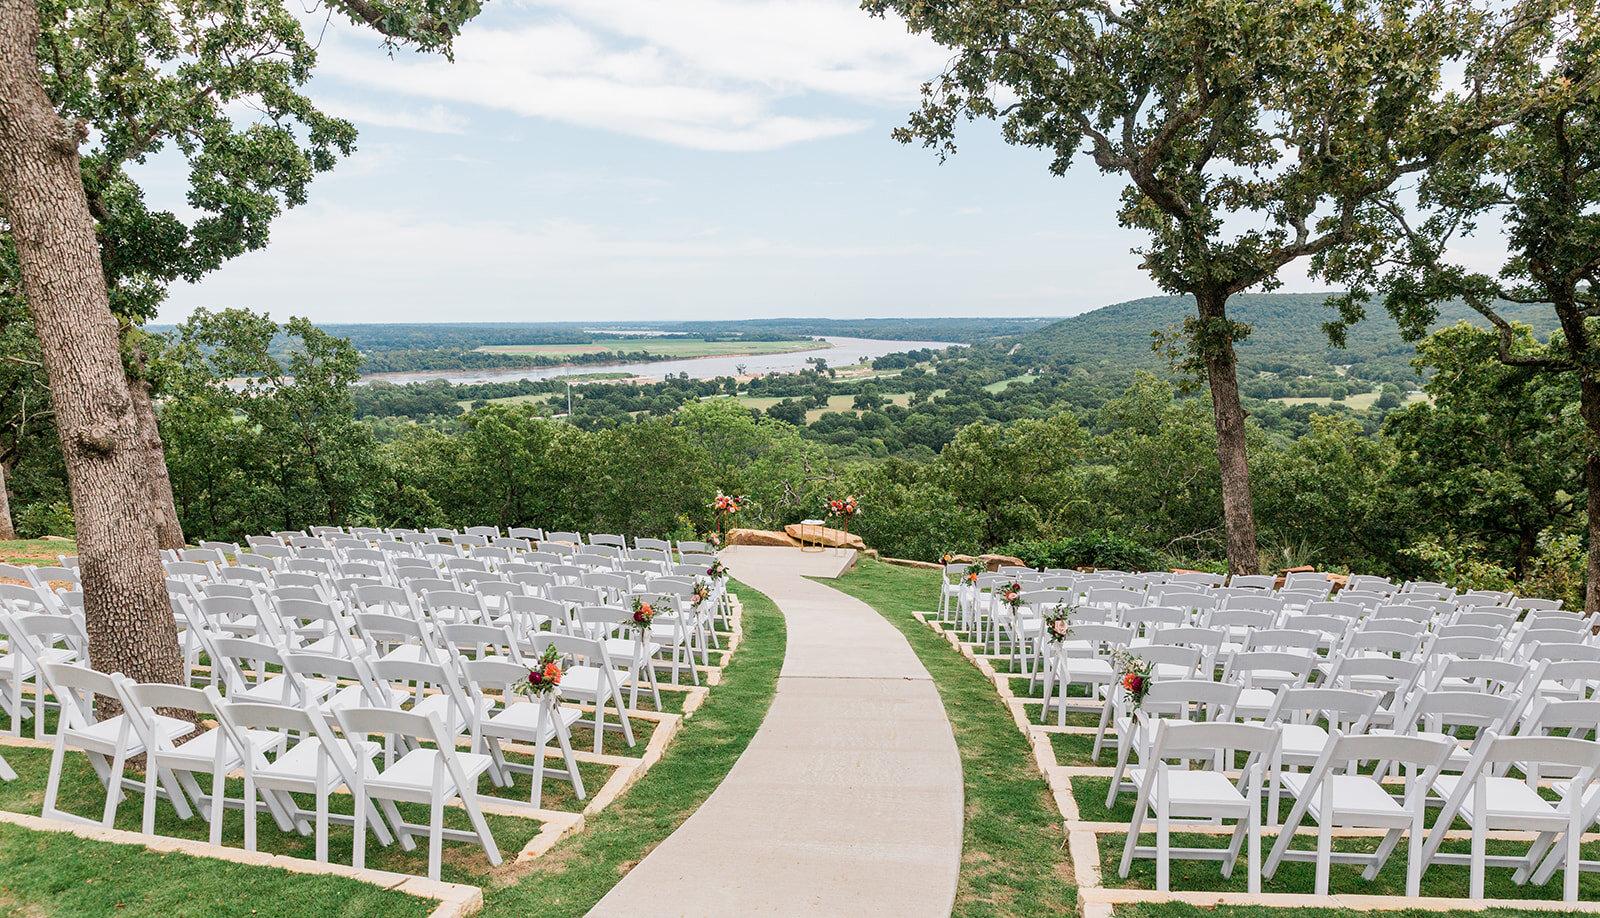 Tulsa Oklahoma Wedding Venues 39a.jpg